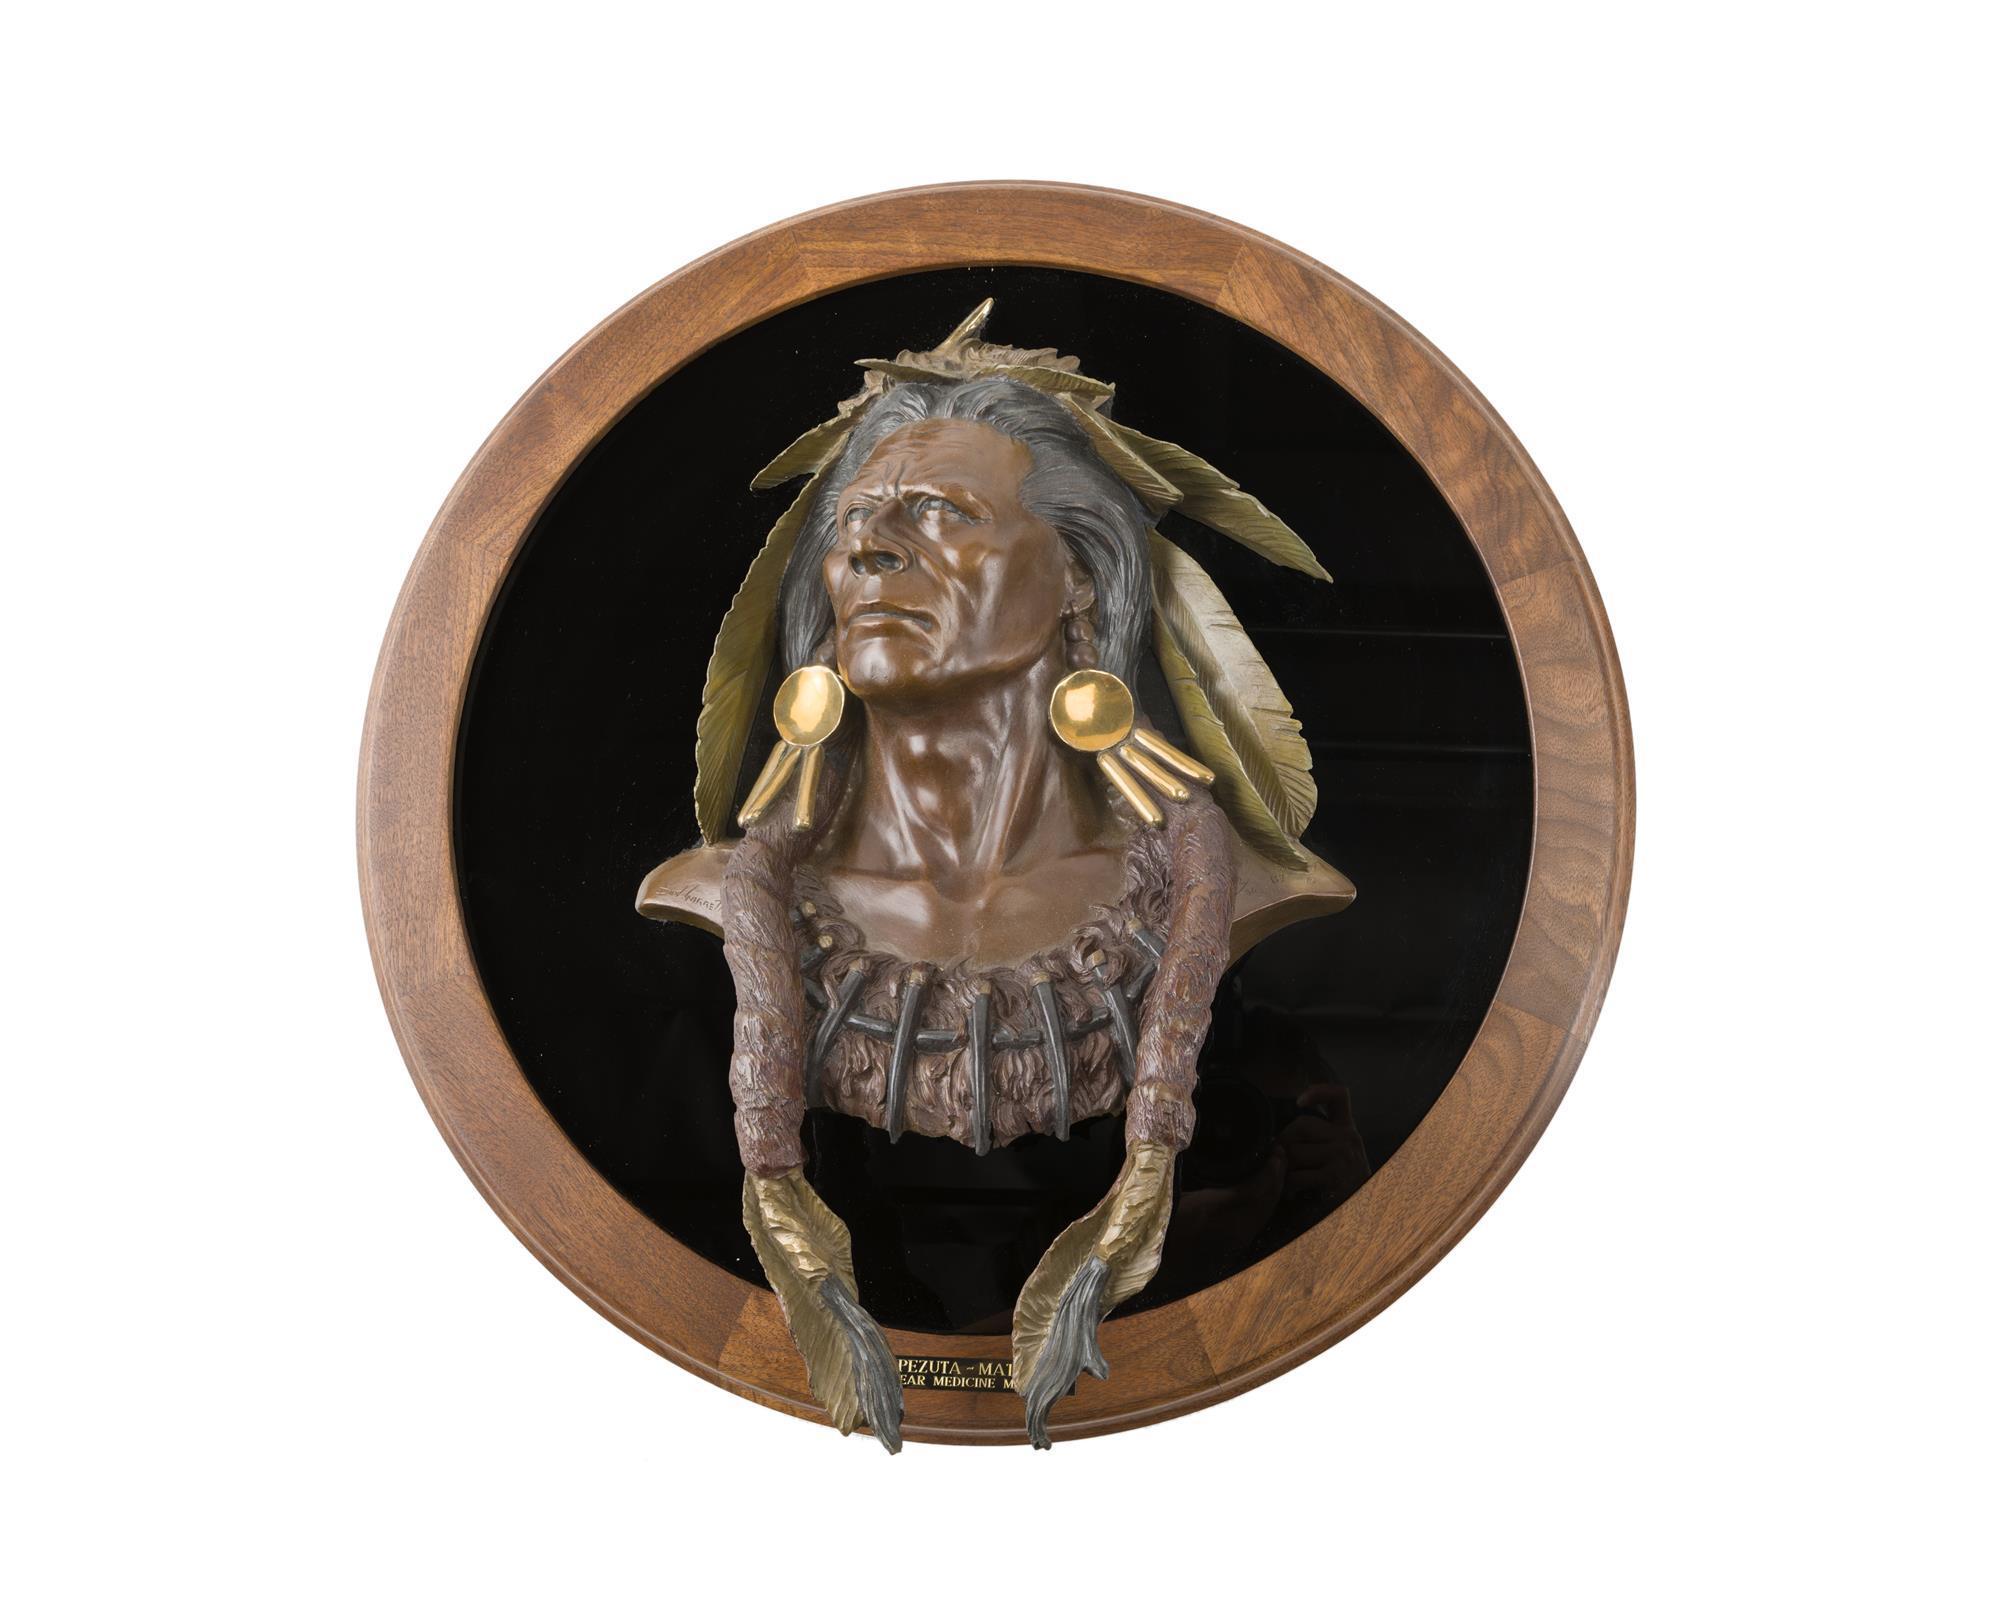 "Dan Garrett, (b. 1948 Wyoming), ""Pezuta-Mato"" Bear Medicine Man, Polychrome, patinated and gilt bronze on glass and wood wall plaque, S"